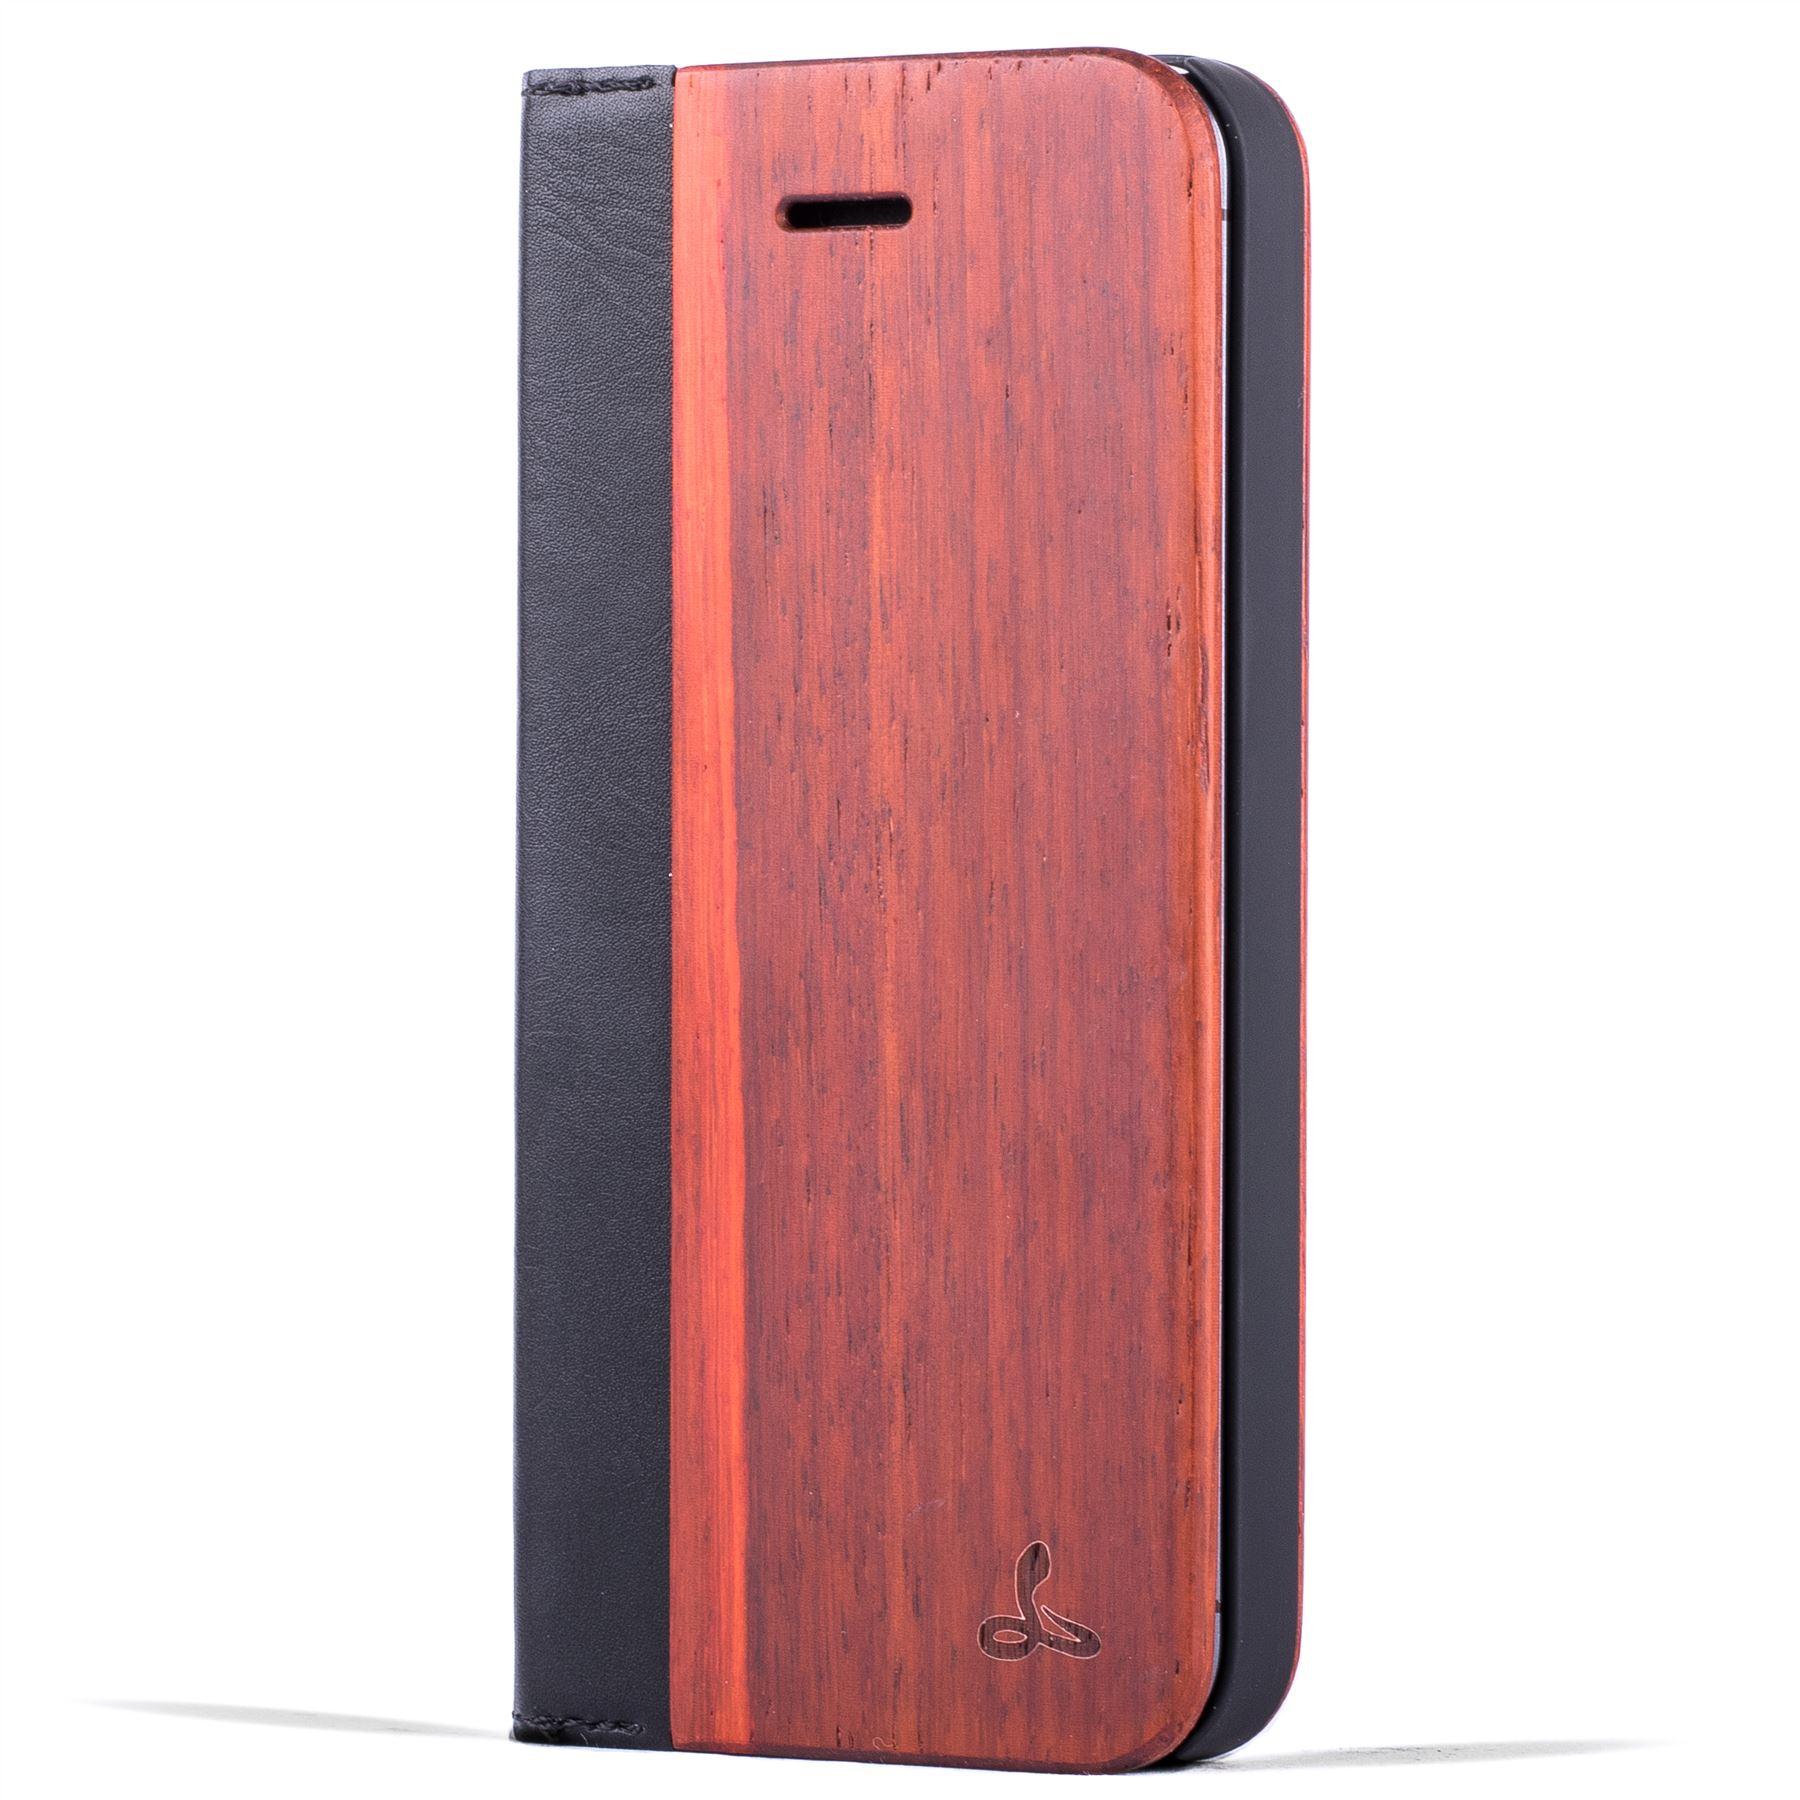 snakehive real wood leather wallet flip case cover for apple iphone 5 5s se ebay. Black Bedroom Furniture Sets. Home Design Ideas